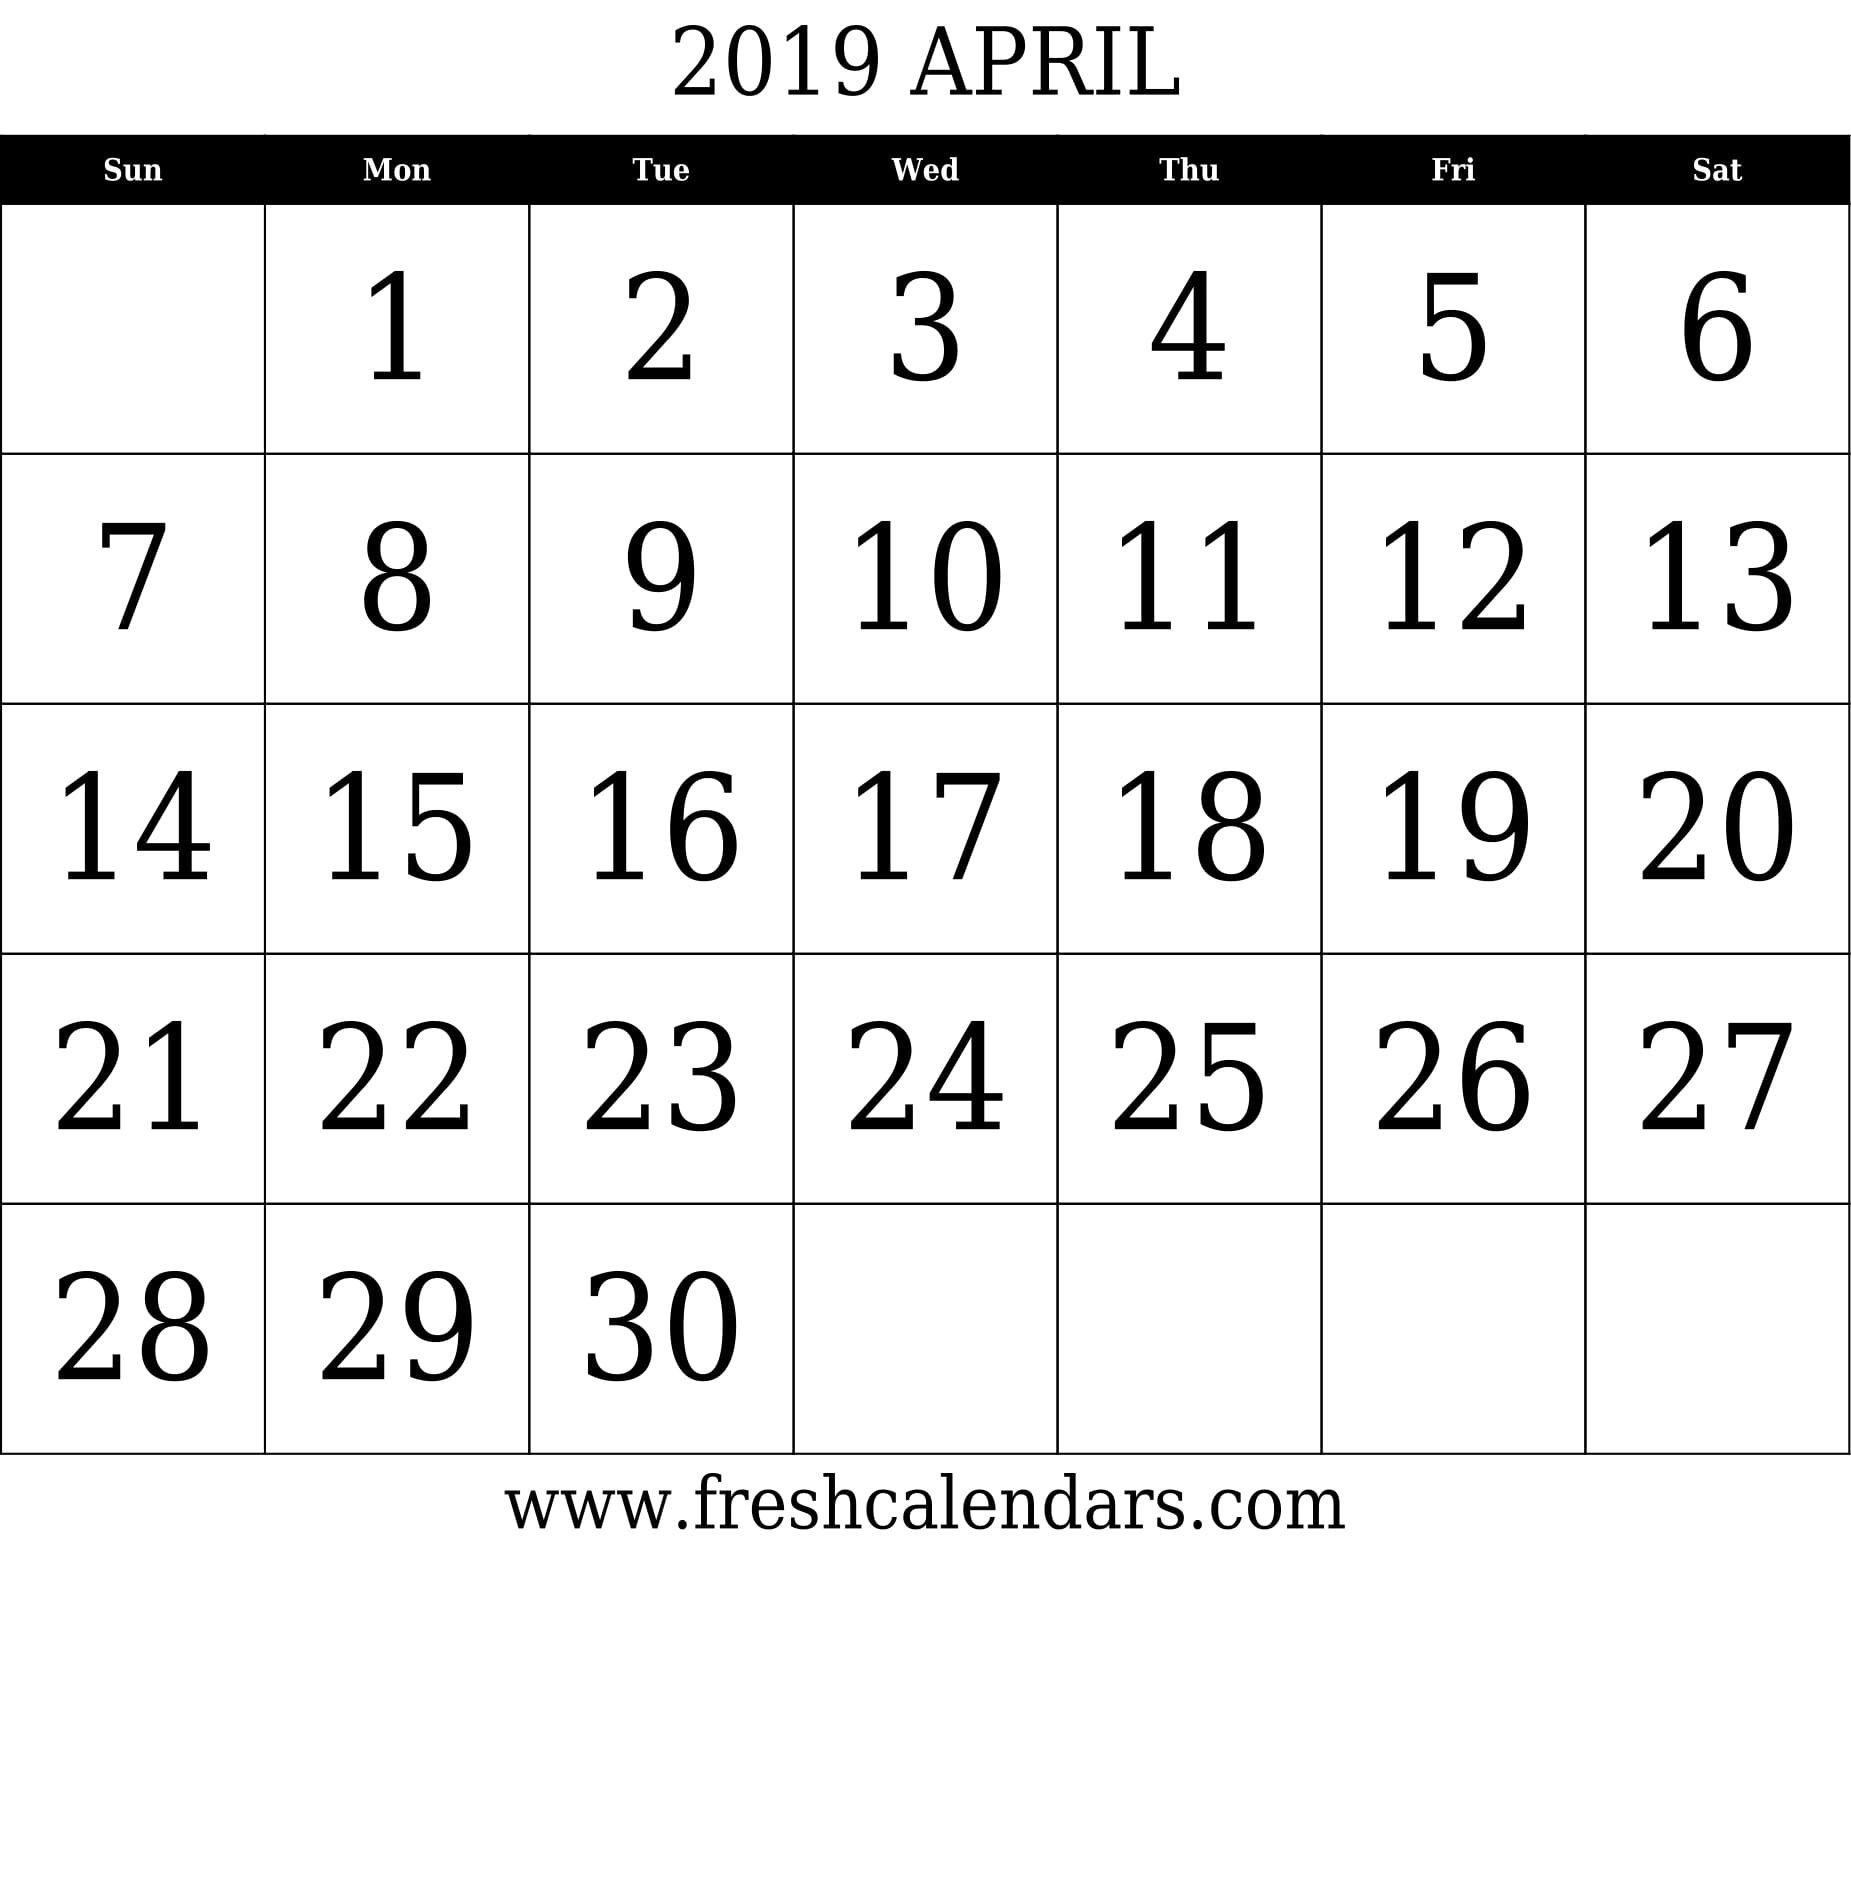 April 2019 Calendar Printable – Fresh Calendars April 8 2019 Calendar